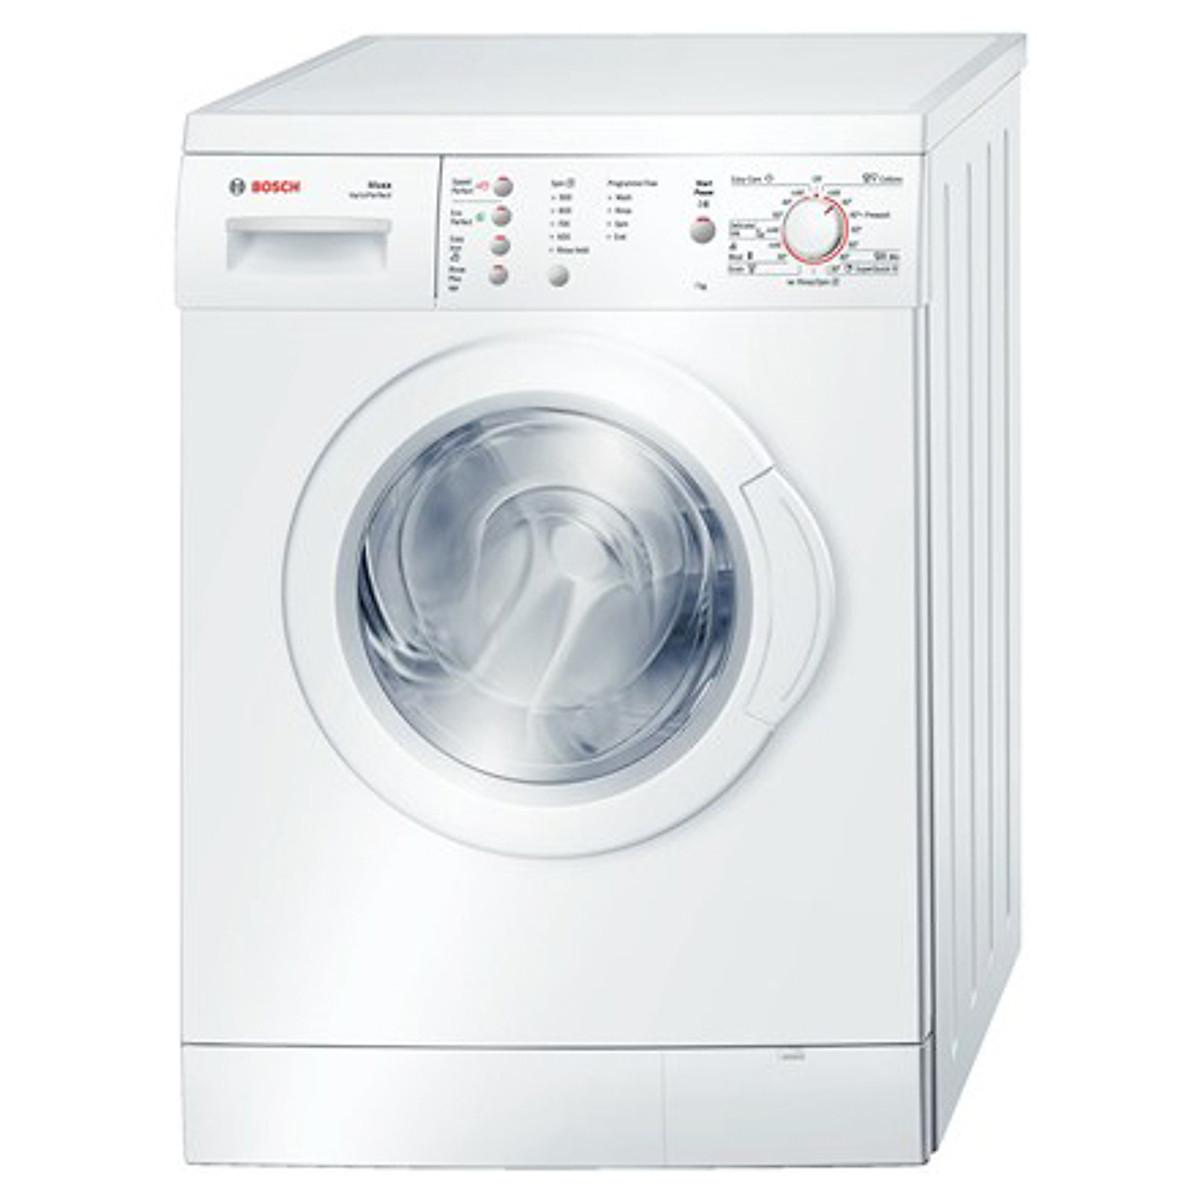 Máy Giặt Cửa trước BOSCH WAE18161SG